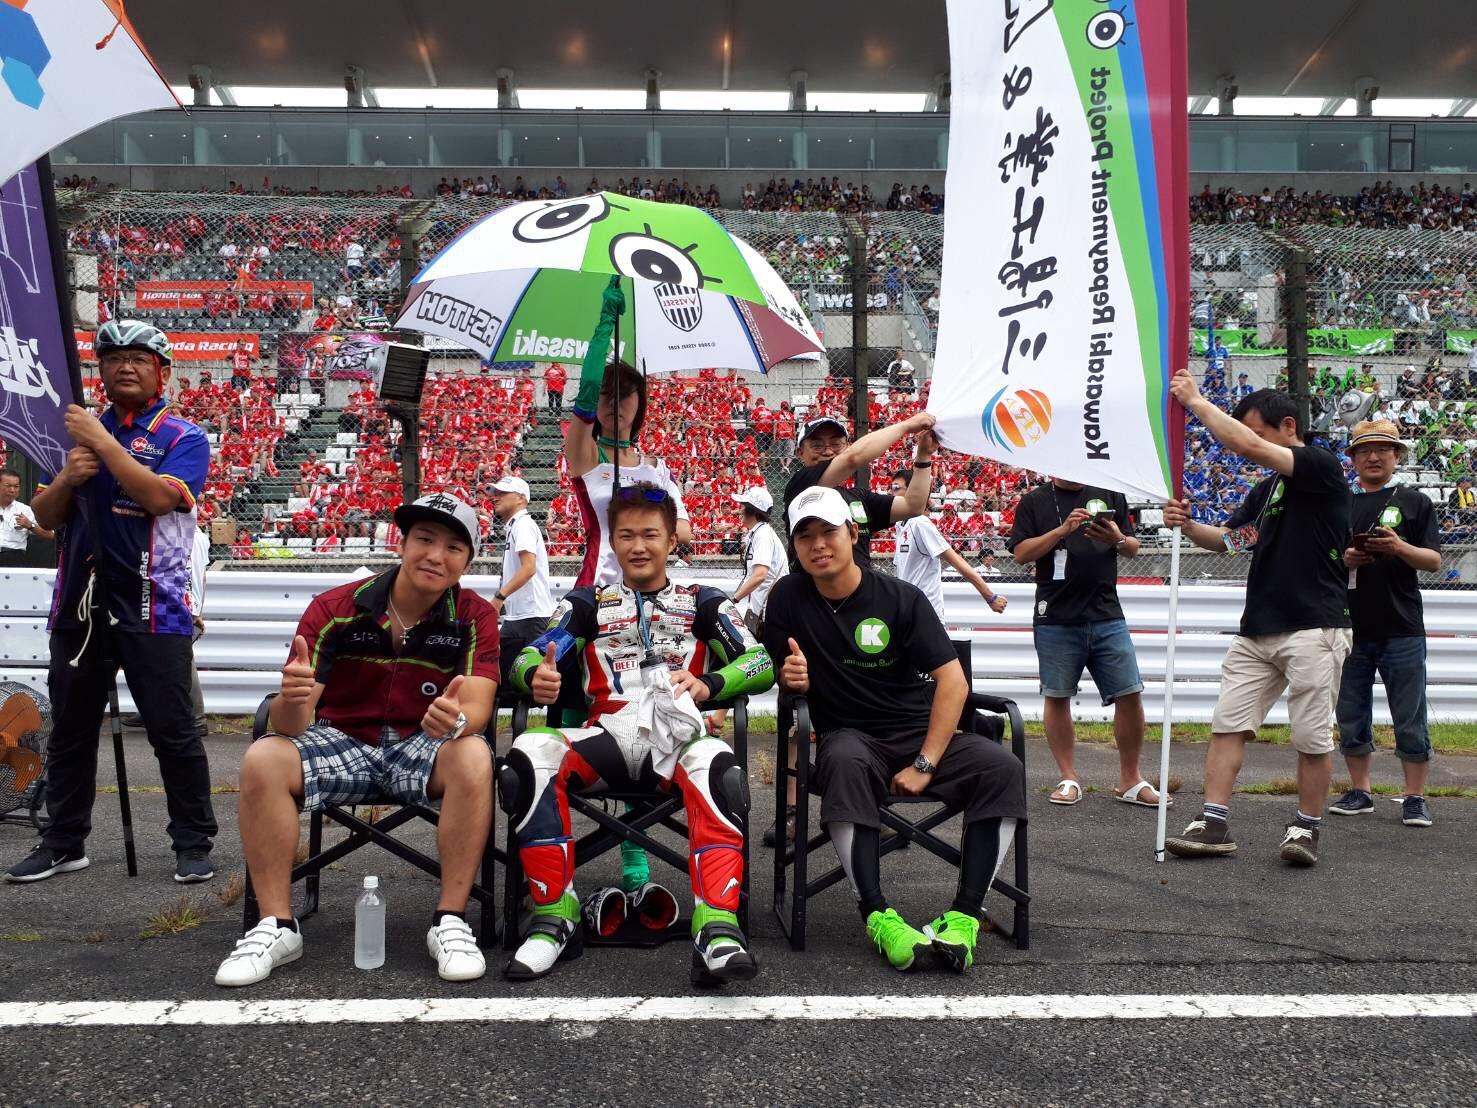 Motorzに鈴鹿8耐公式予選の取材記事が公開されました。